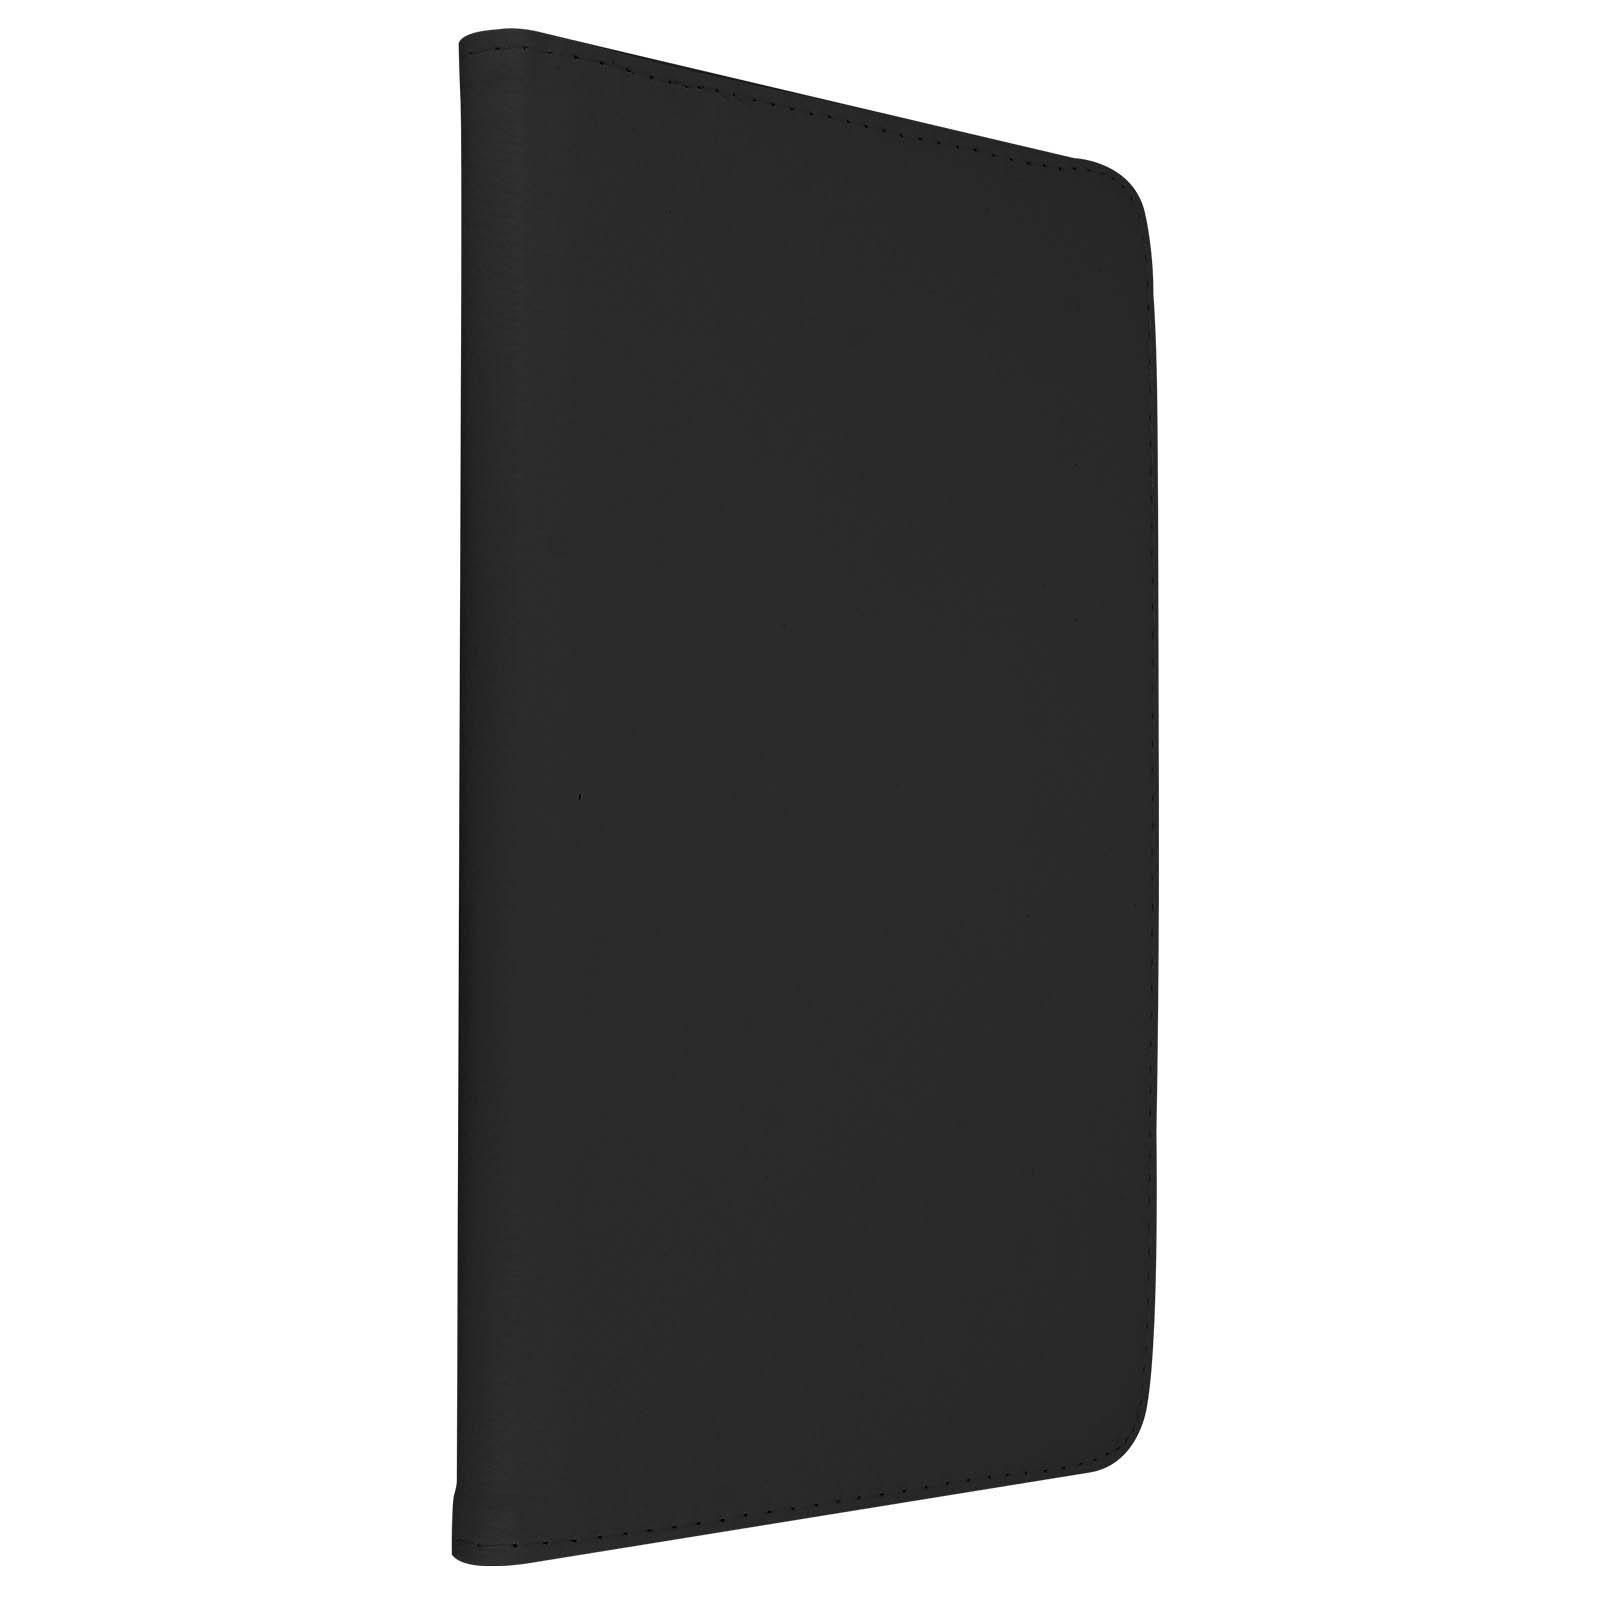 akashi folio galaxy tab a6 10 1 noir etui tablette akashi sur. Black Bedroom Furniture Sets. Home Design Ideas